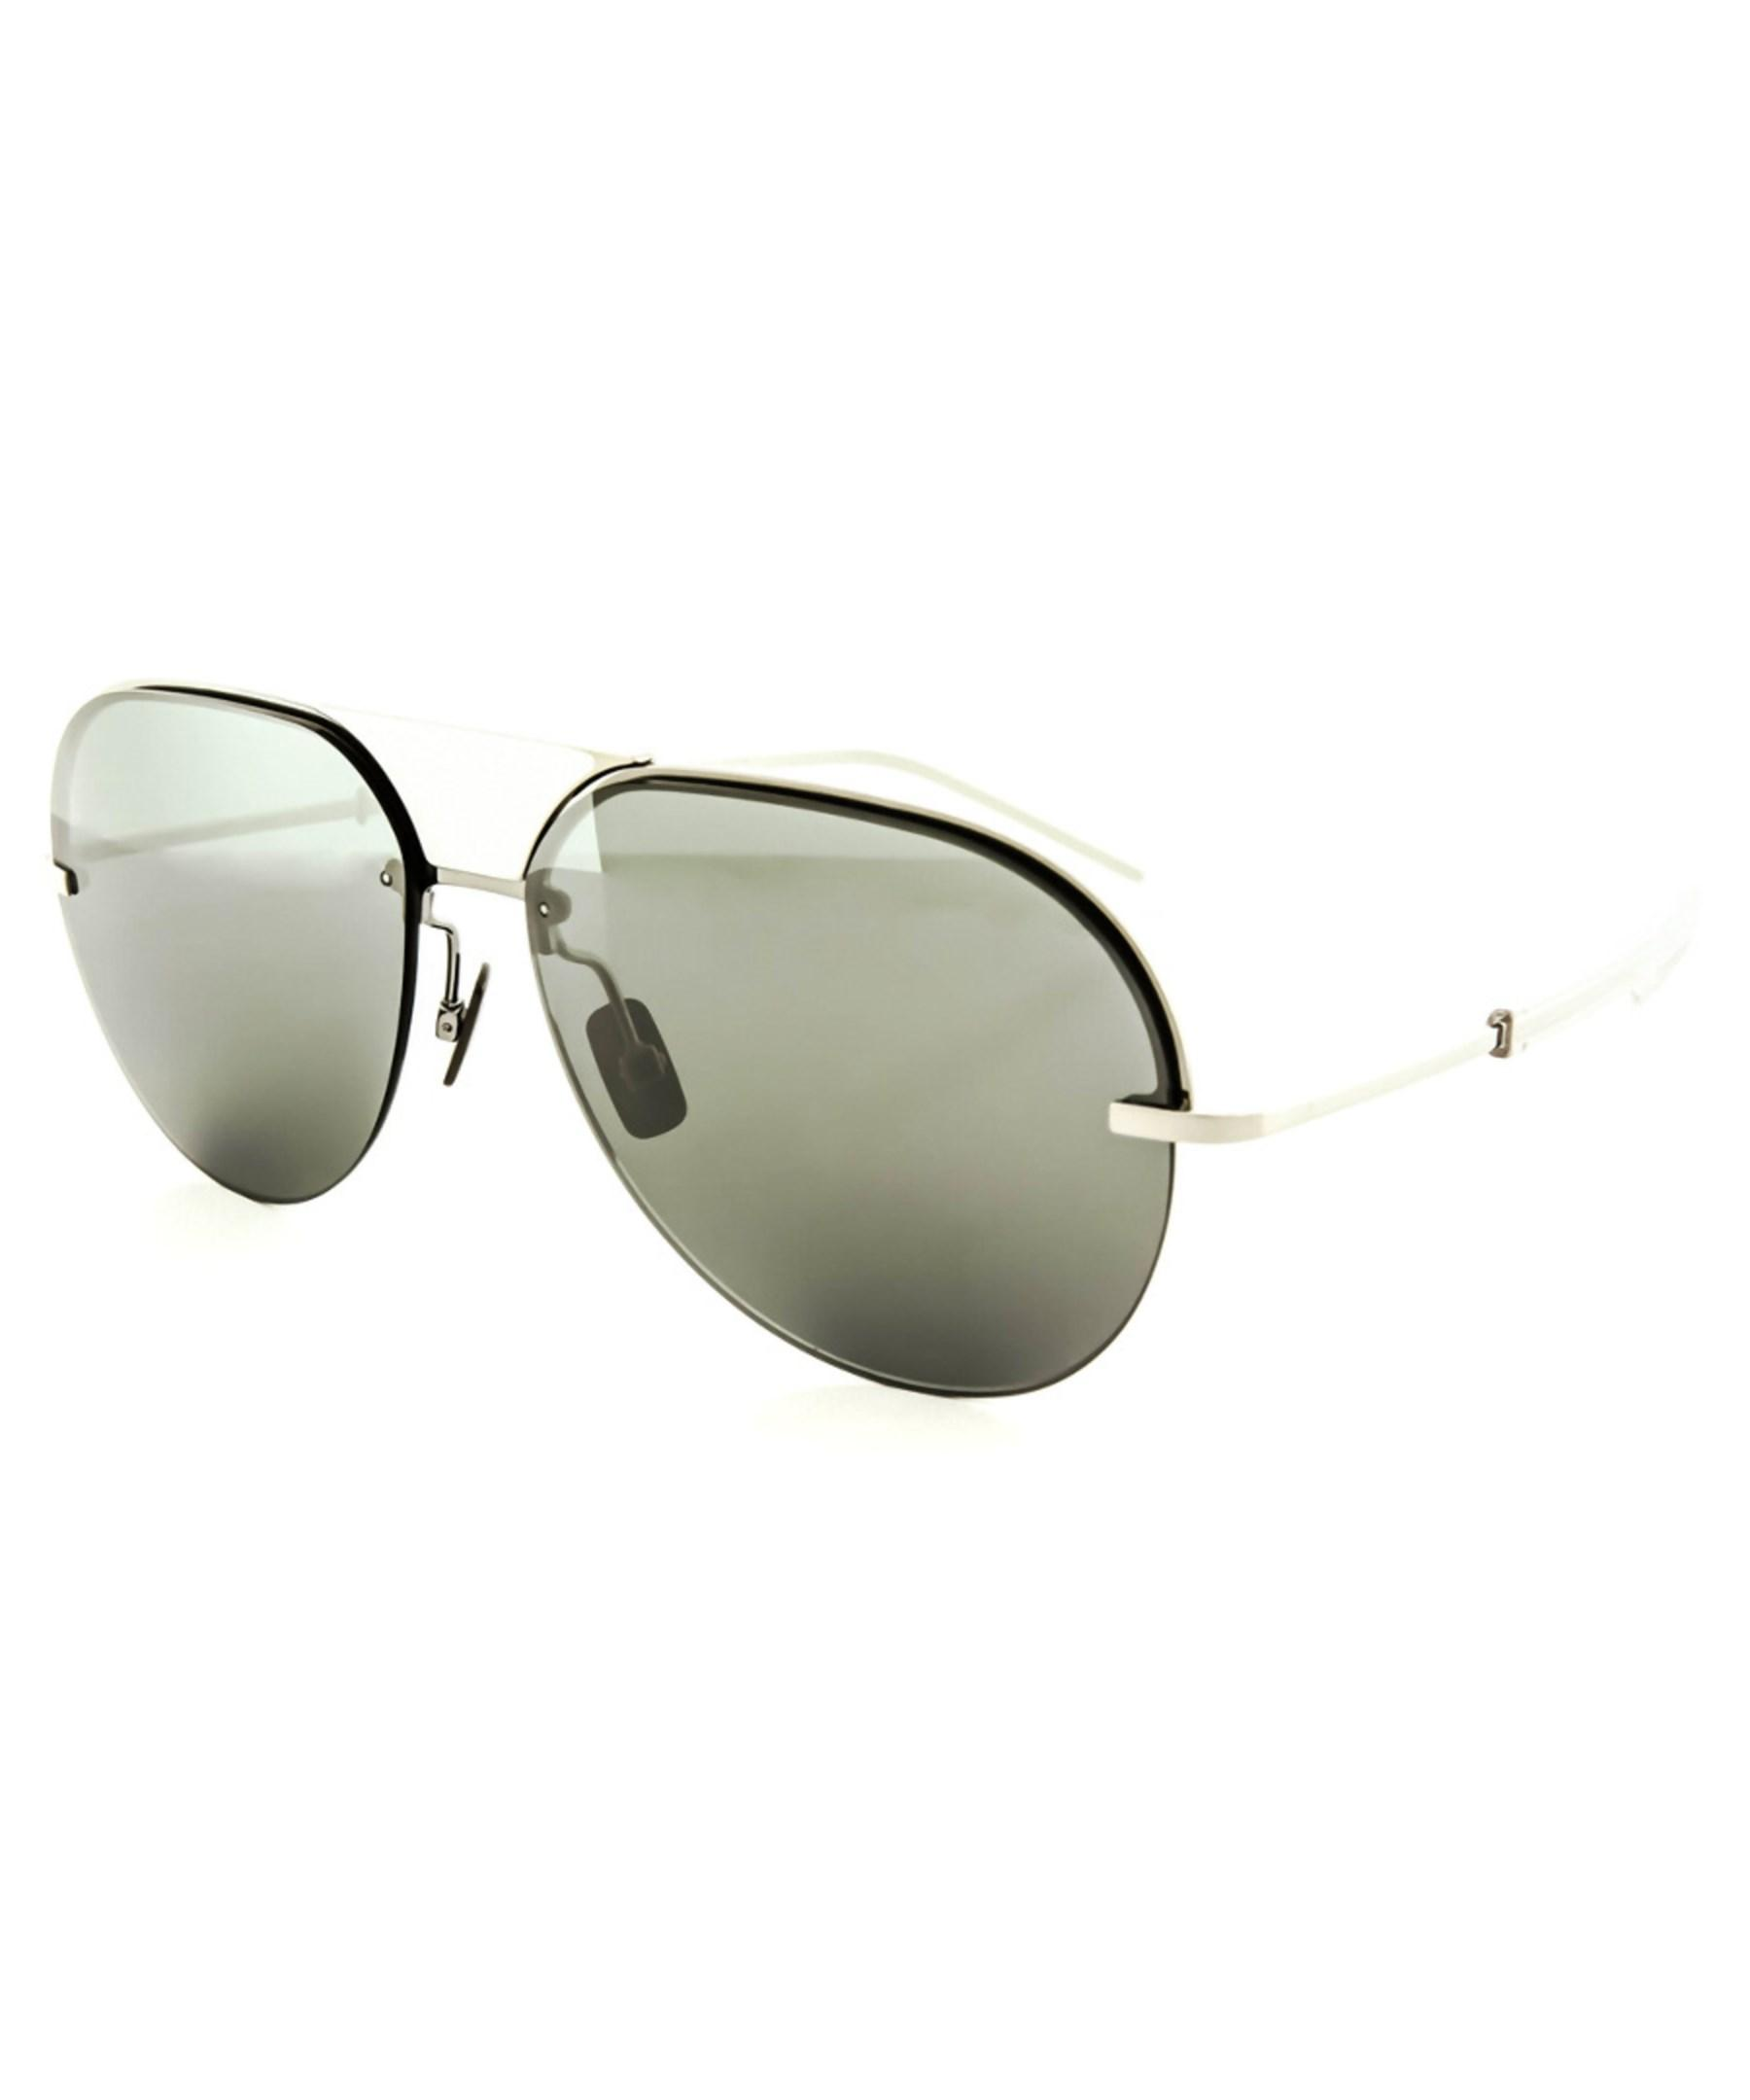 59fc6ecab130 Lyst - Dior Unisex Scale 1.0 Sunglasses in Gray